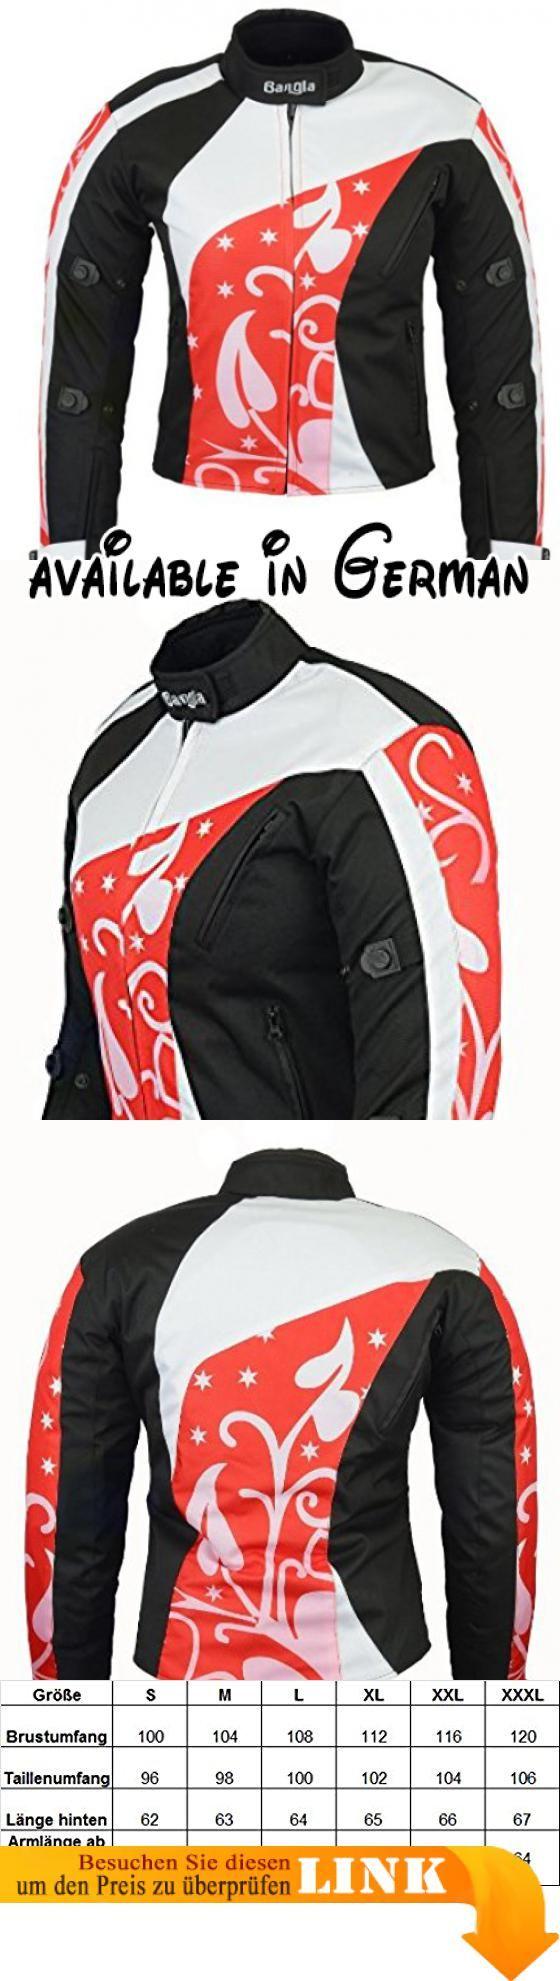 B-07 Bangla Damen Motorrad Jacke Textil Cordura600 rot gemustert ...